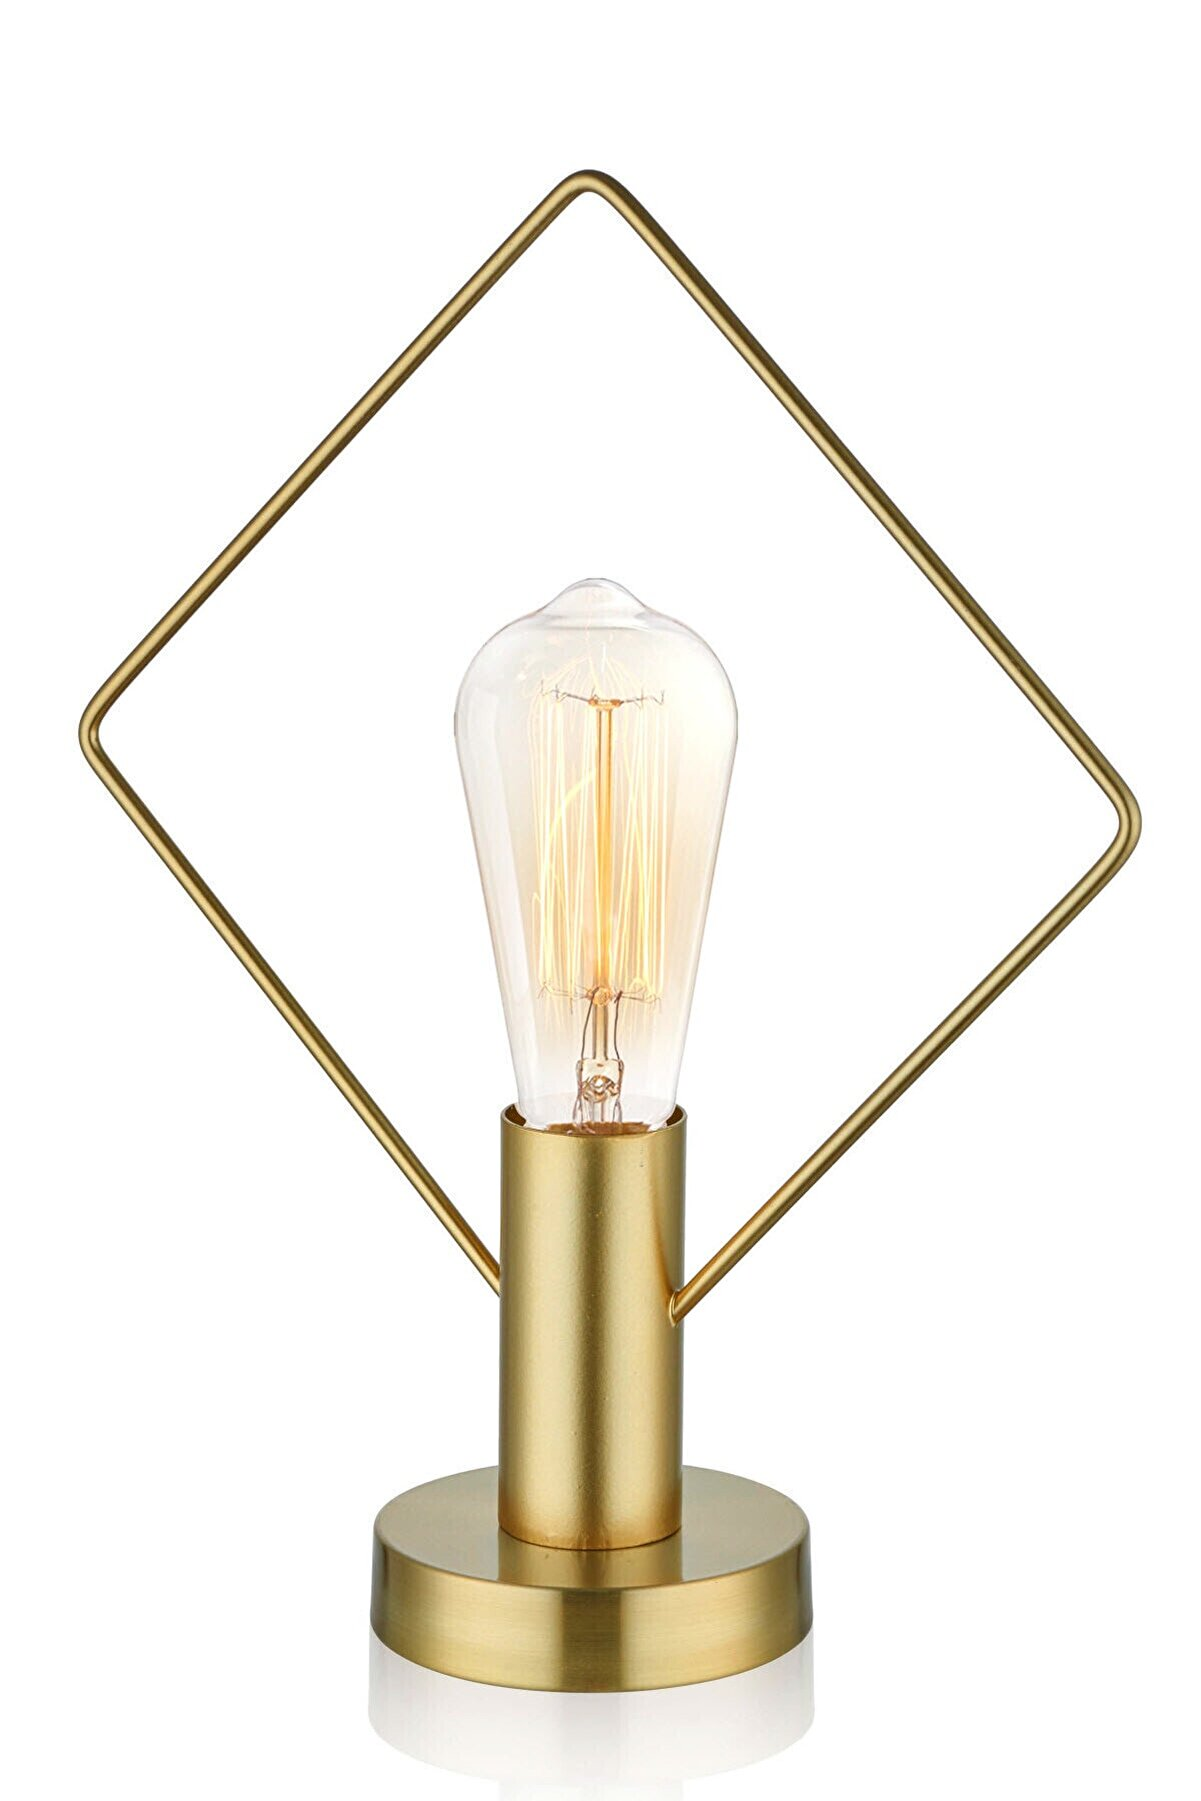 The Mia Abajur Gold 35 x 28 x 12 Cm